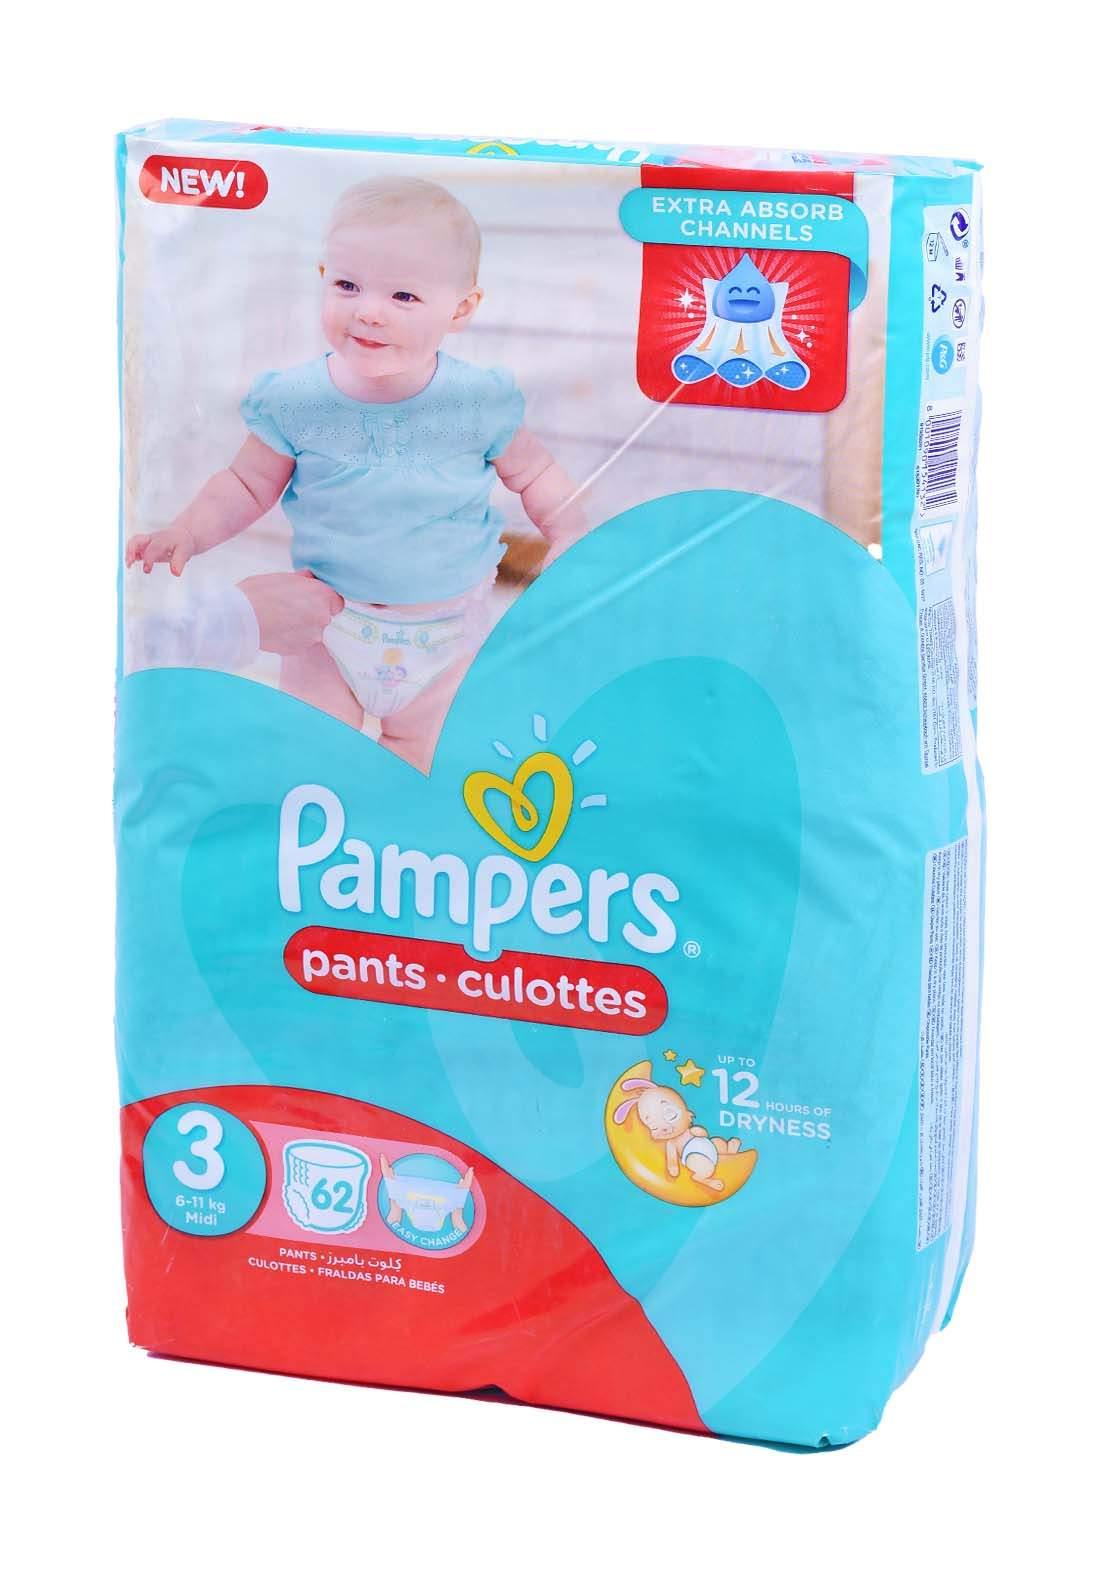 Pampers 6-11 Kg 62 Pcs حفاضات  بامبرز للاطفال كِلوت رقم 3